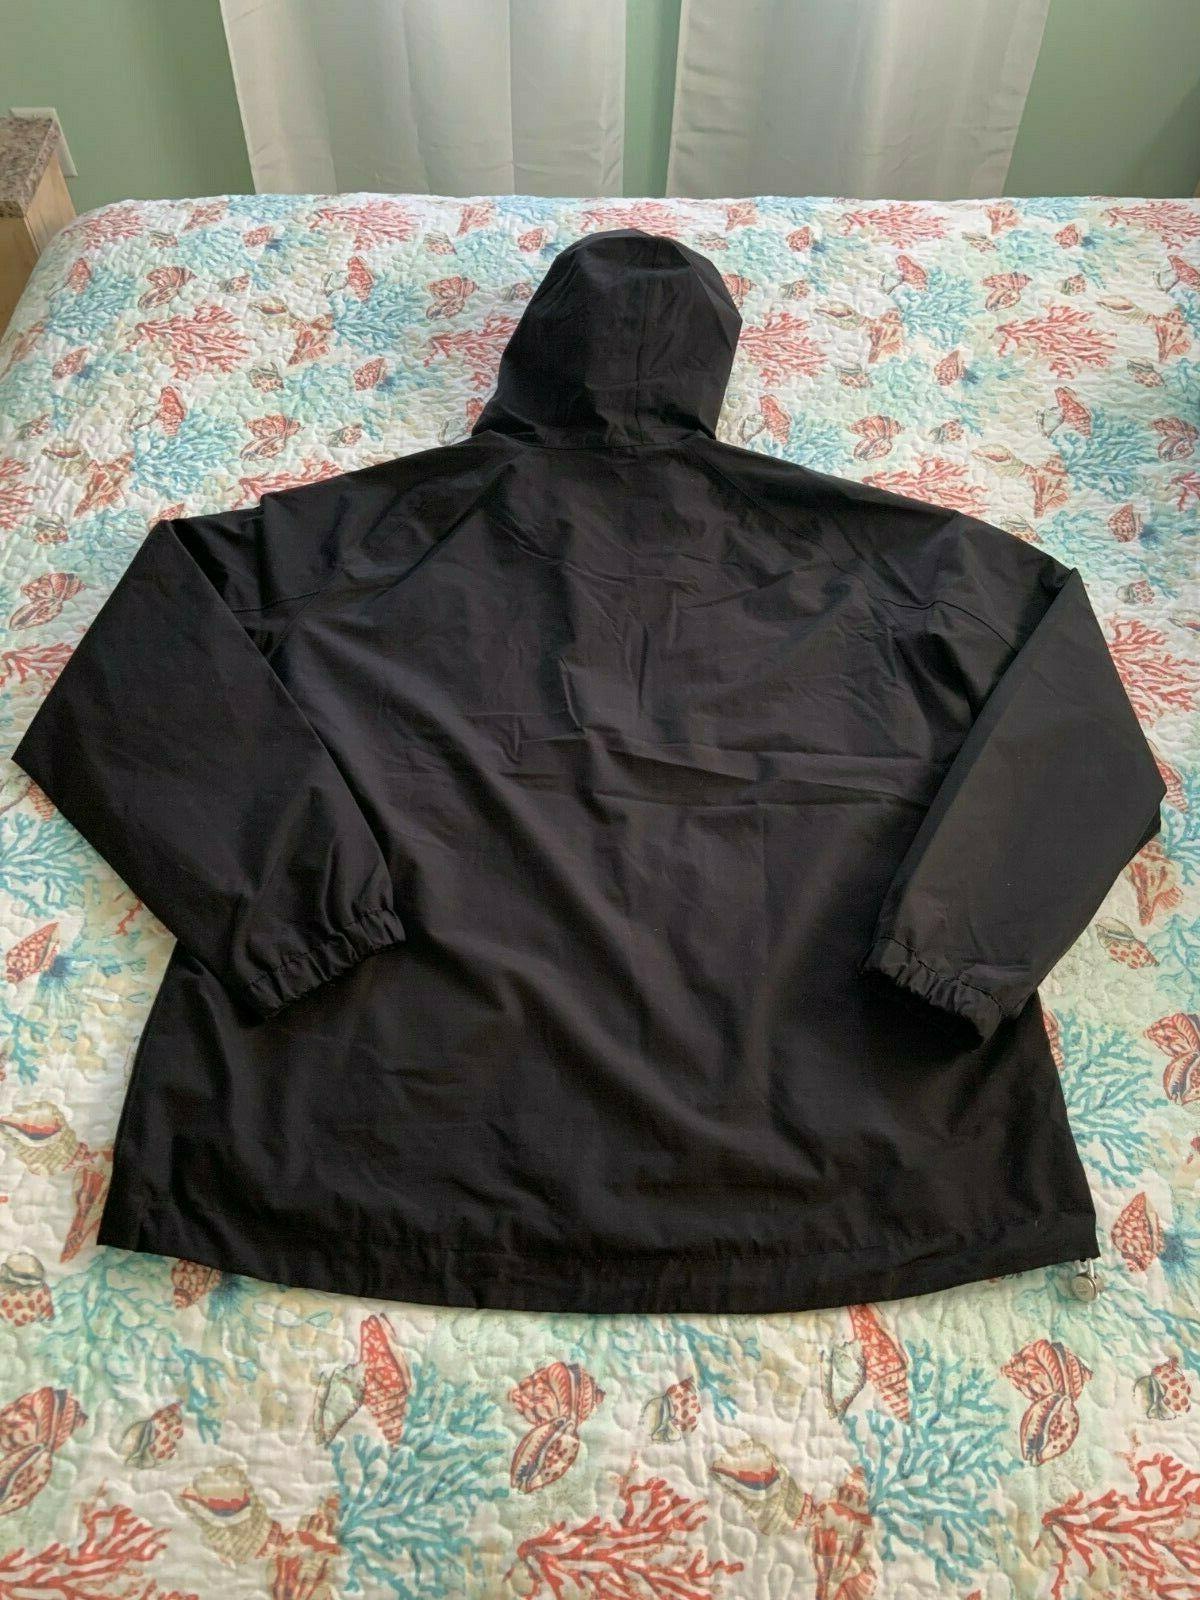 Timberland Hooded Rain Jacket Black XL $138